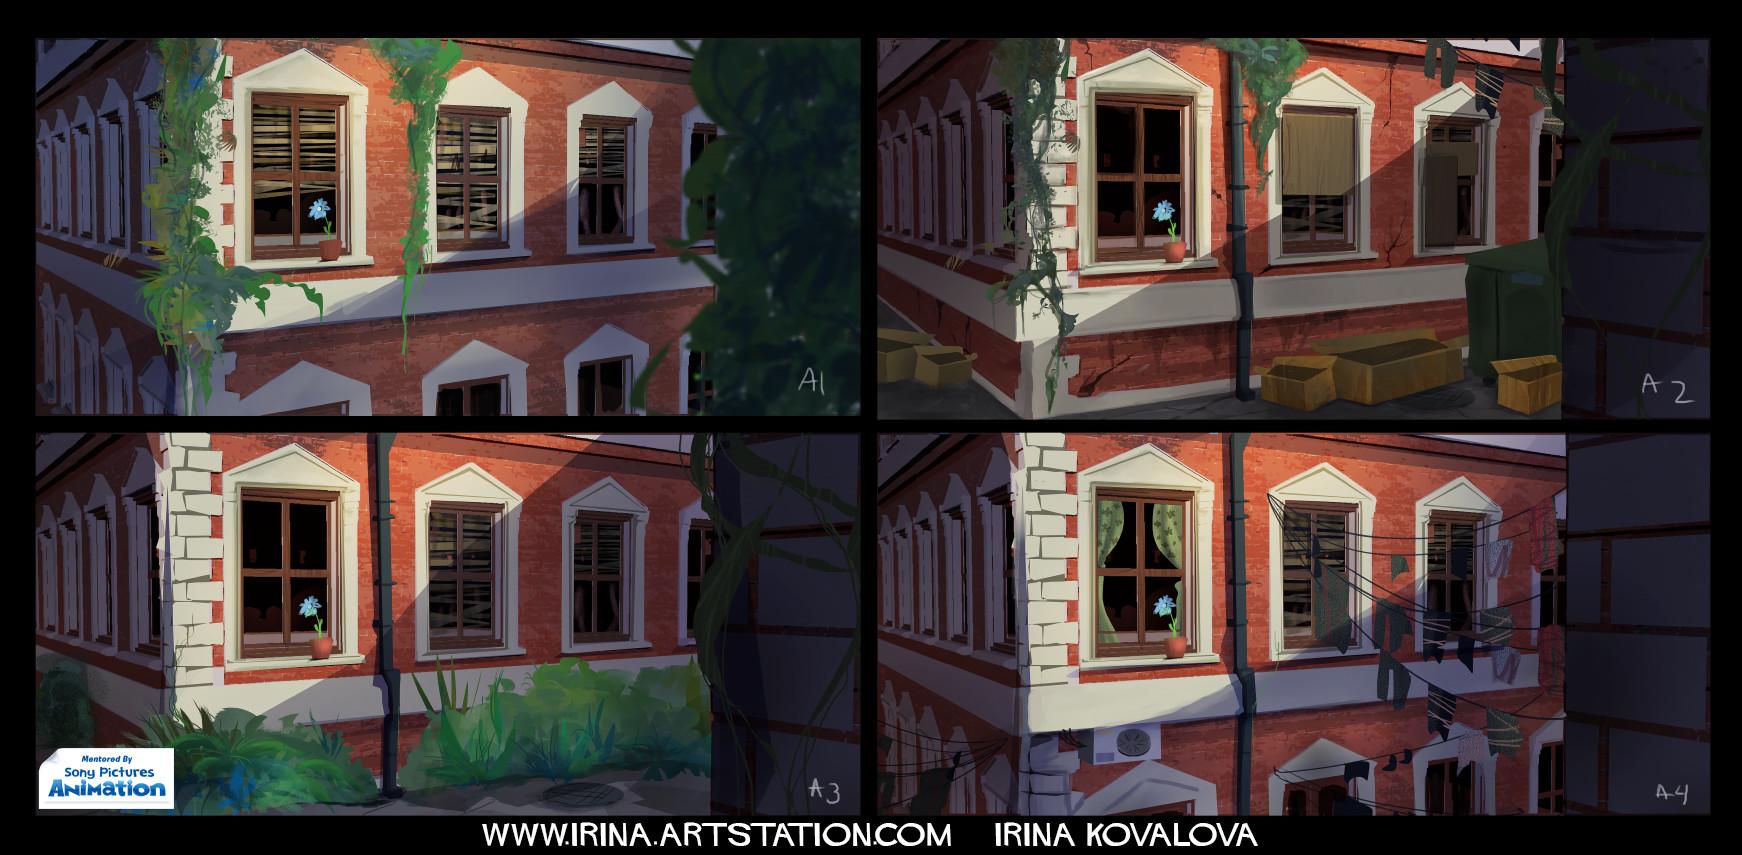 Irina kovalova epl chicago building designs 001 ikovalova